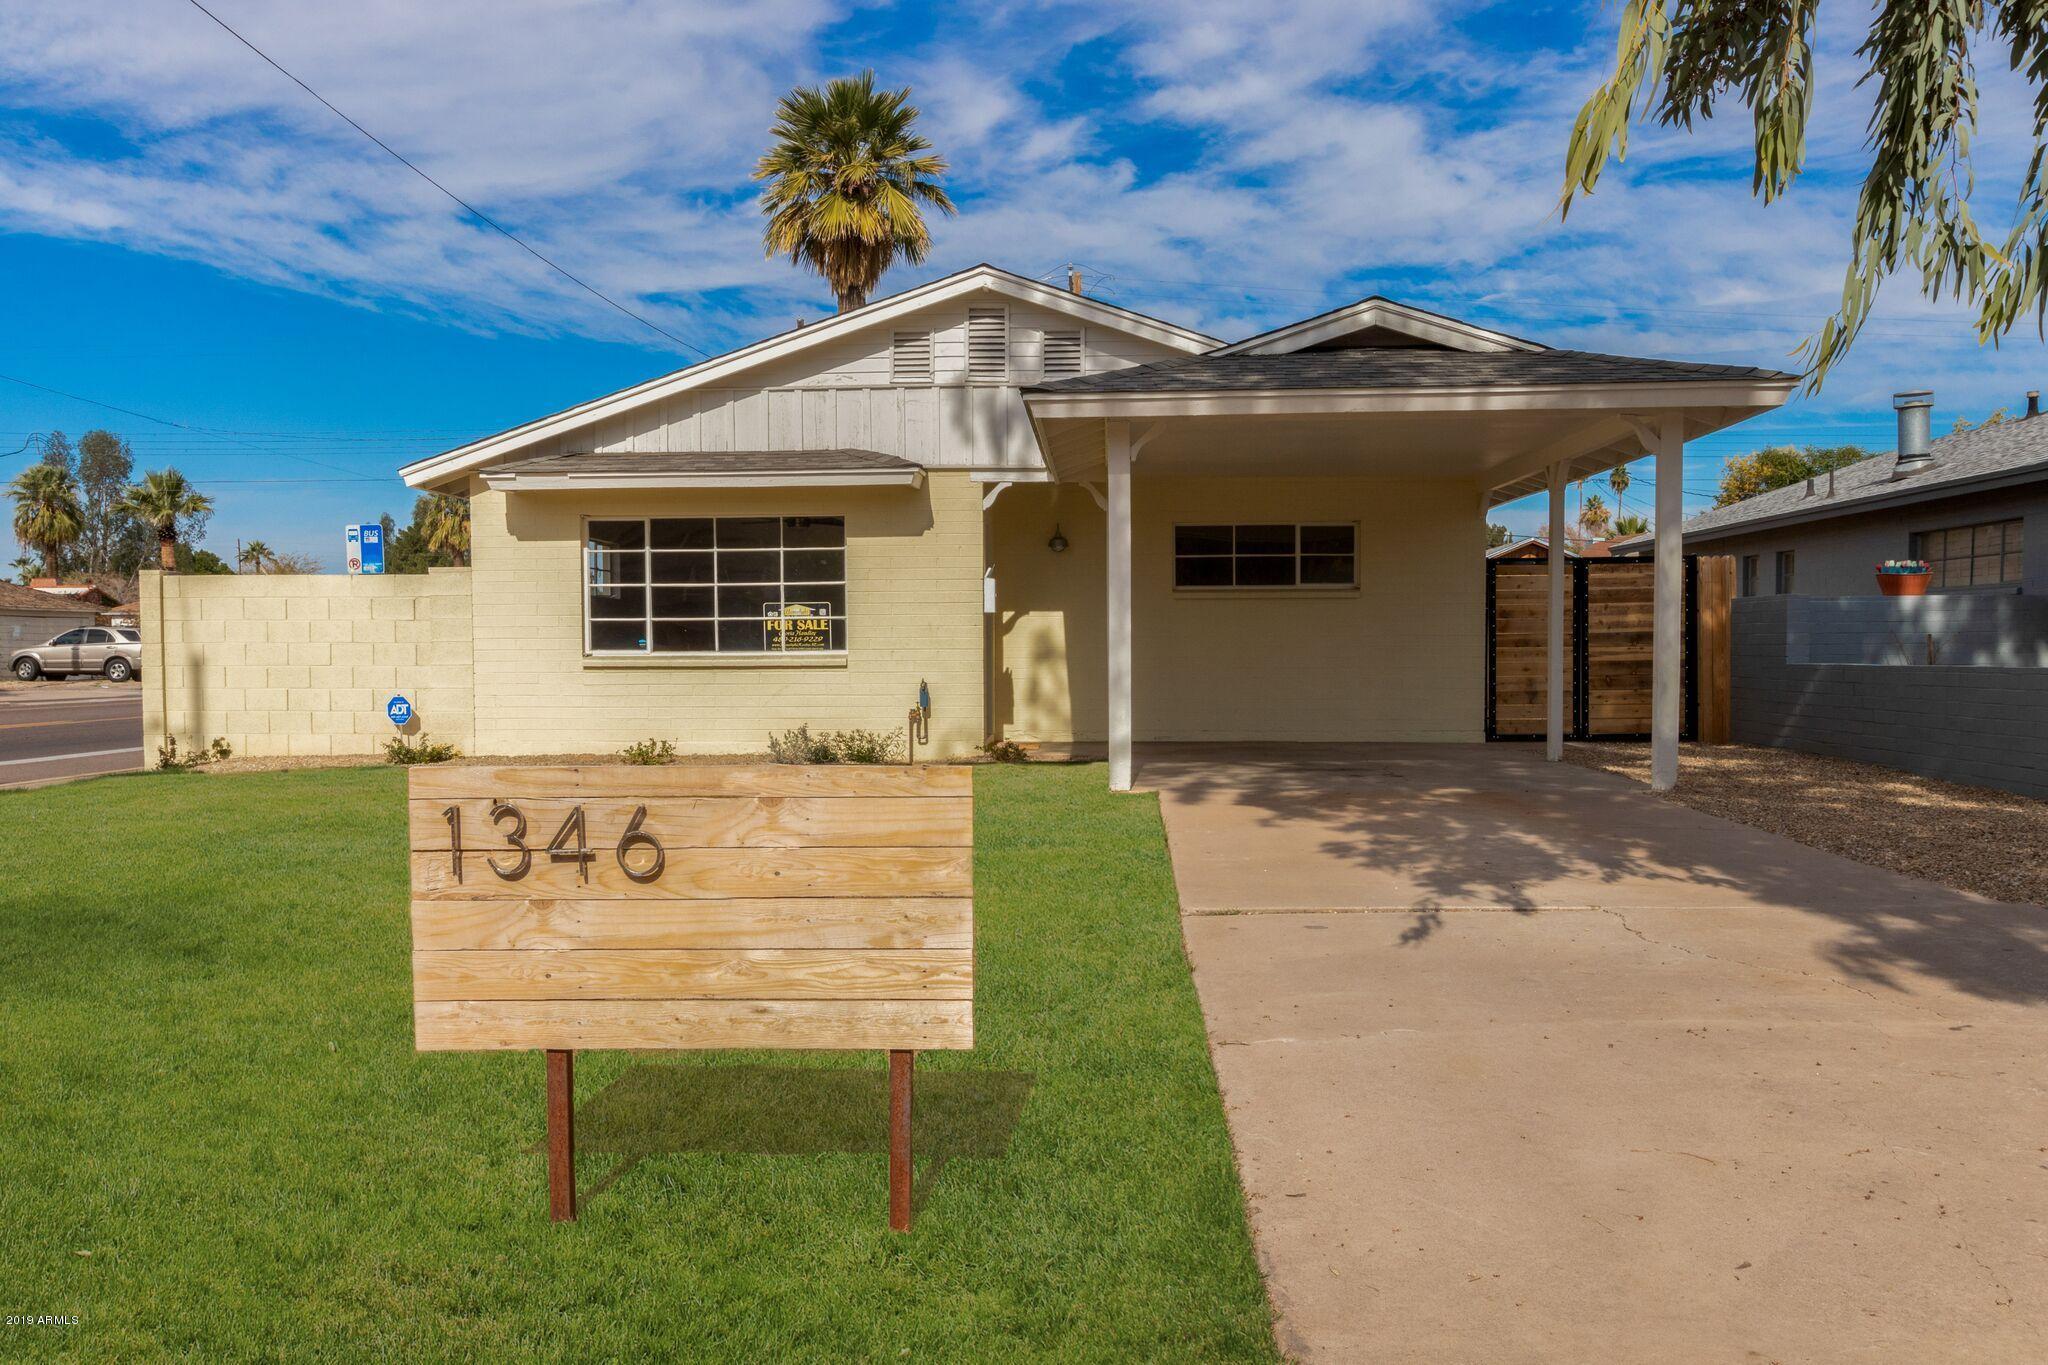 Photo of 1346 W CULVER Street, Phoenix, AZ 85007